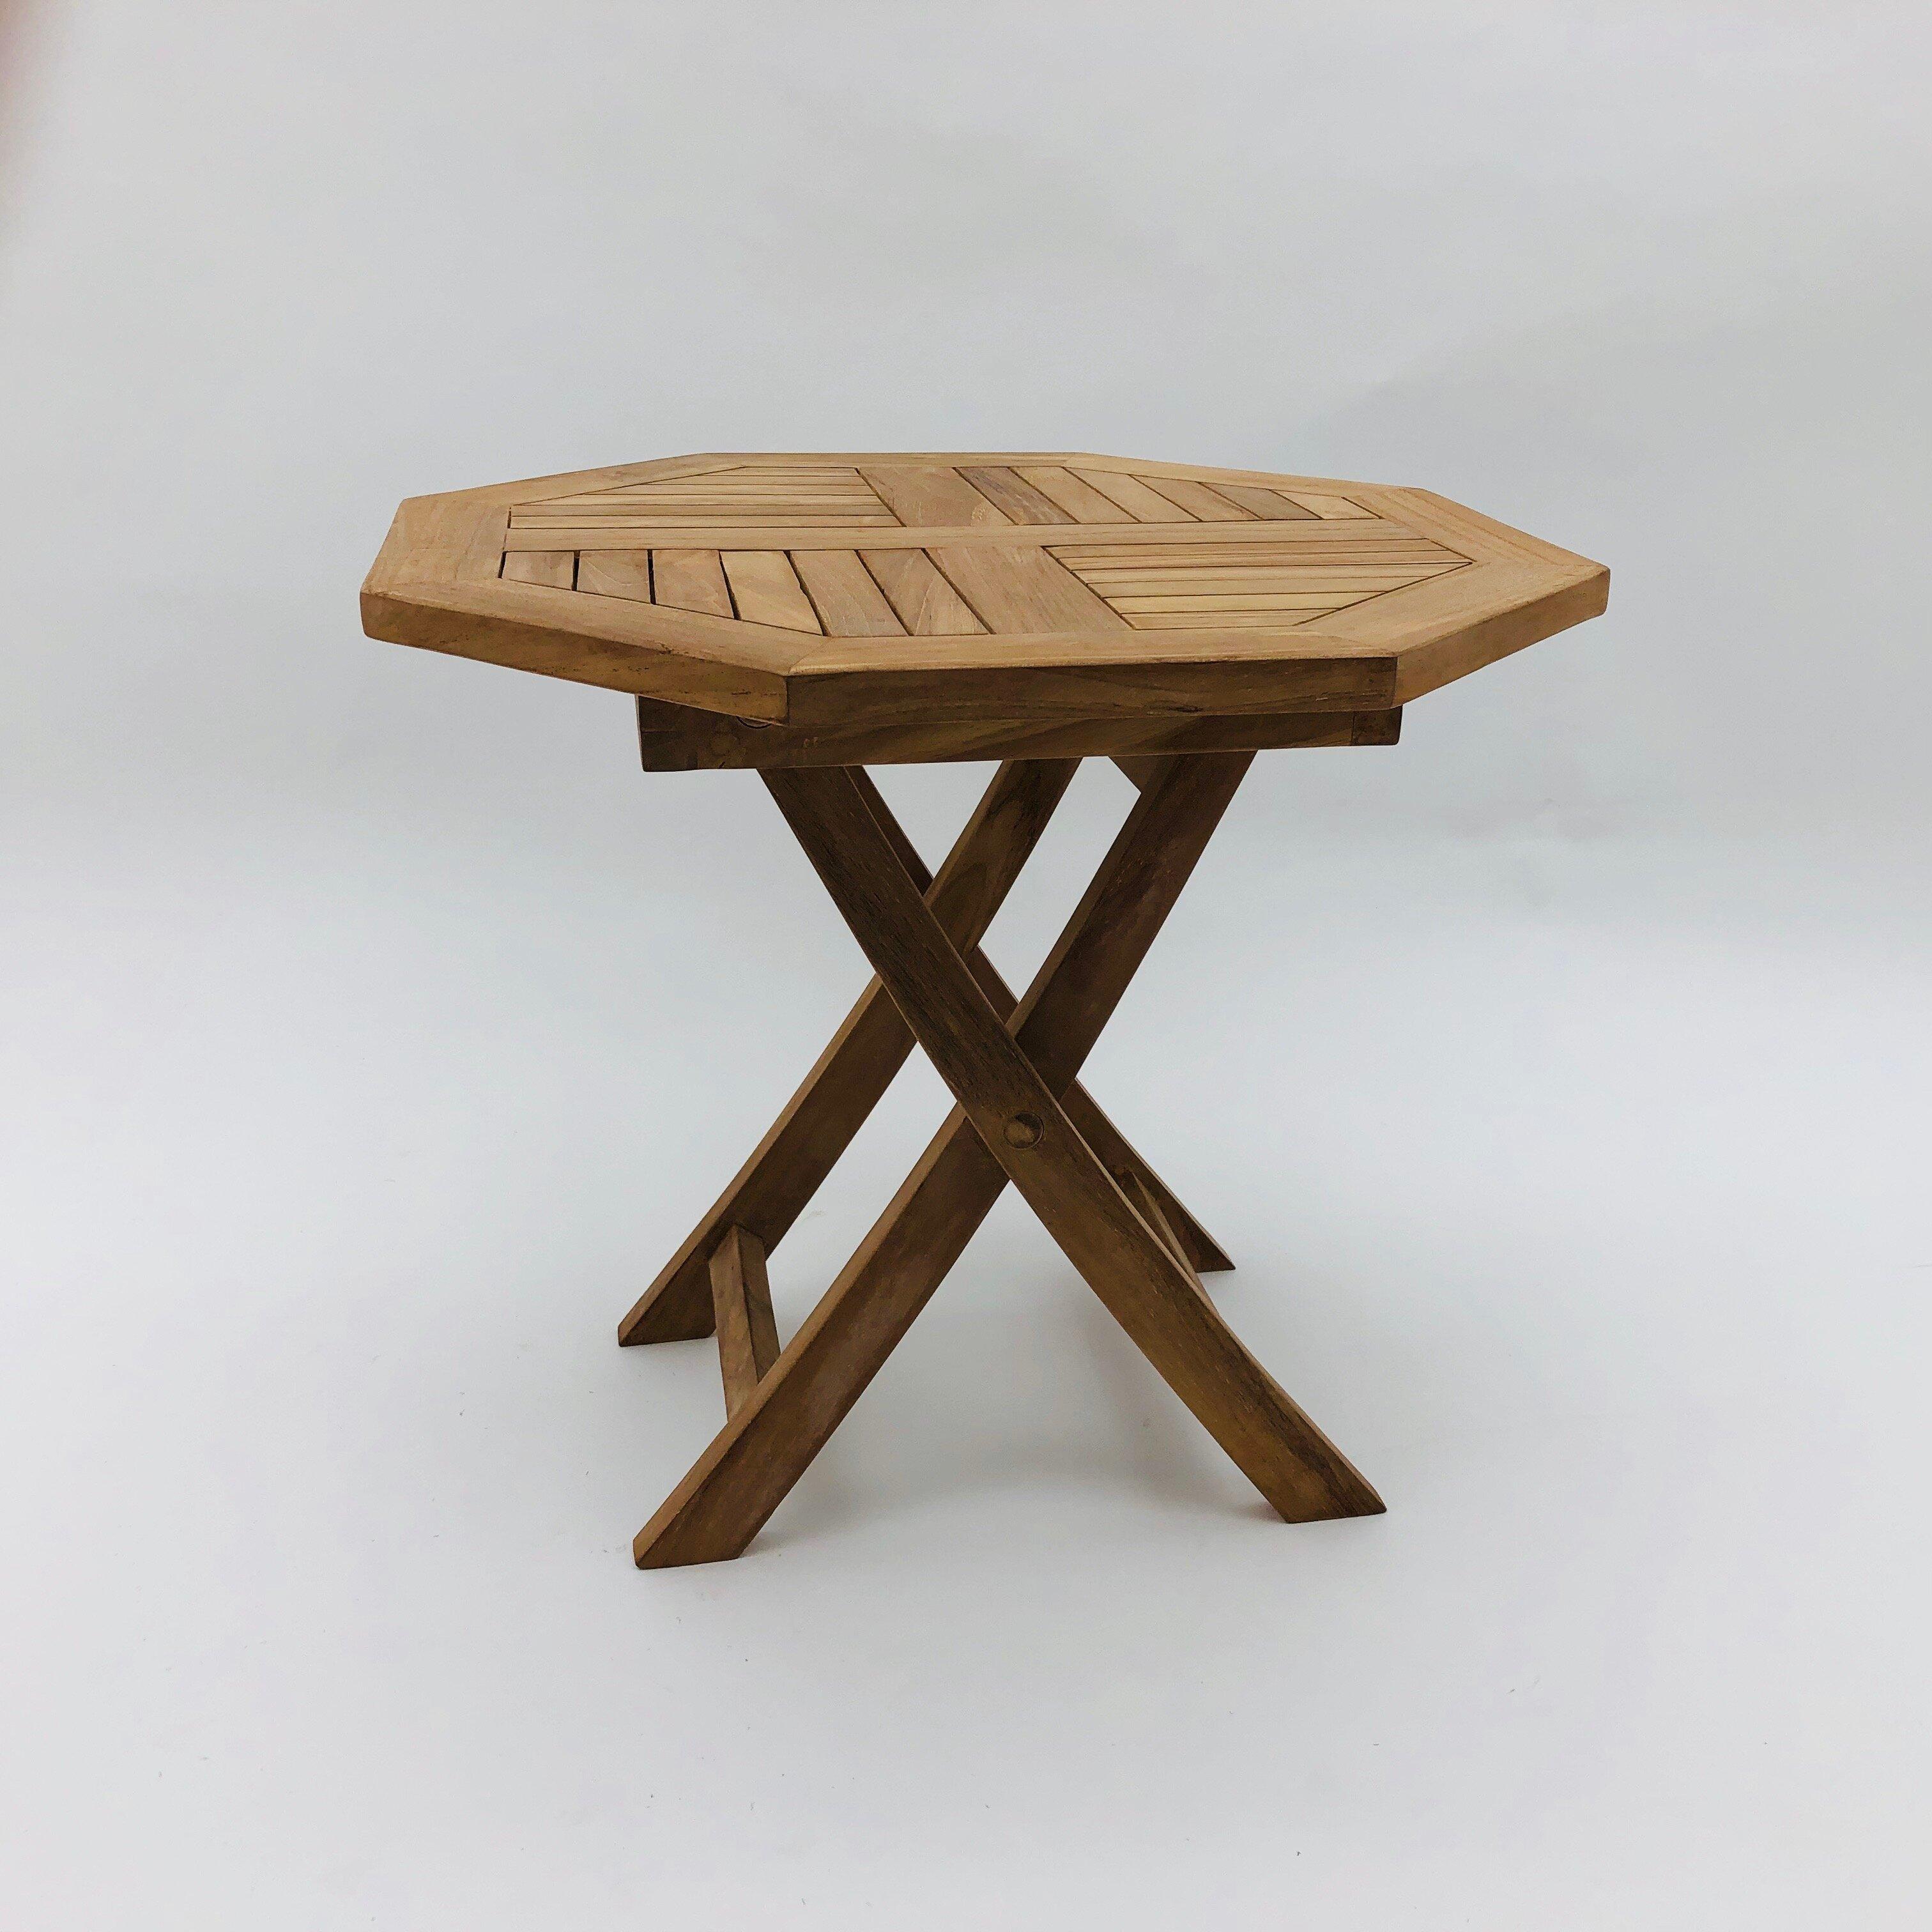 Folding Teak Side Table.Liskeard Folding Teak Side Table